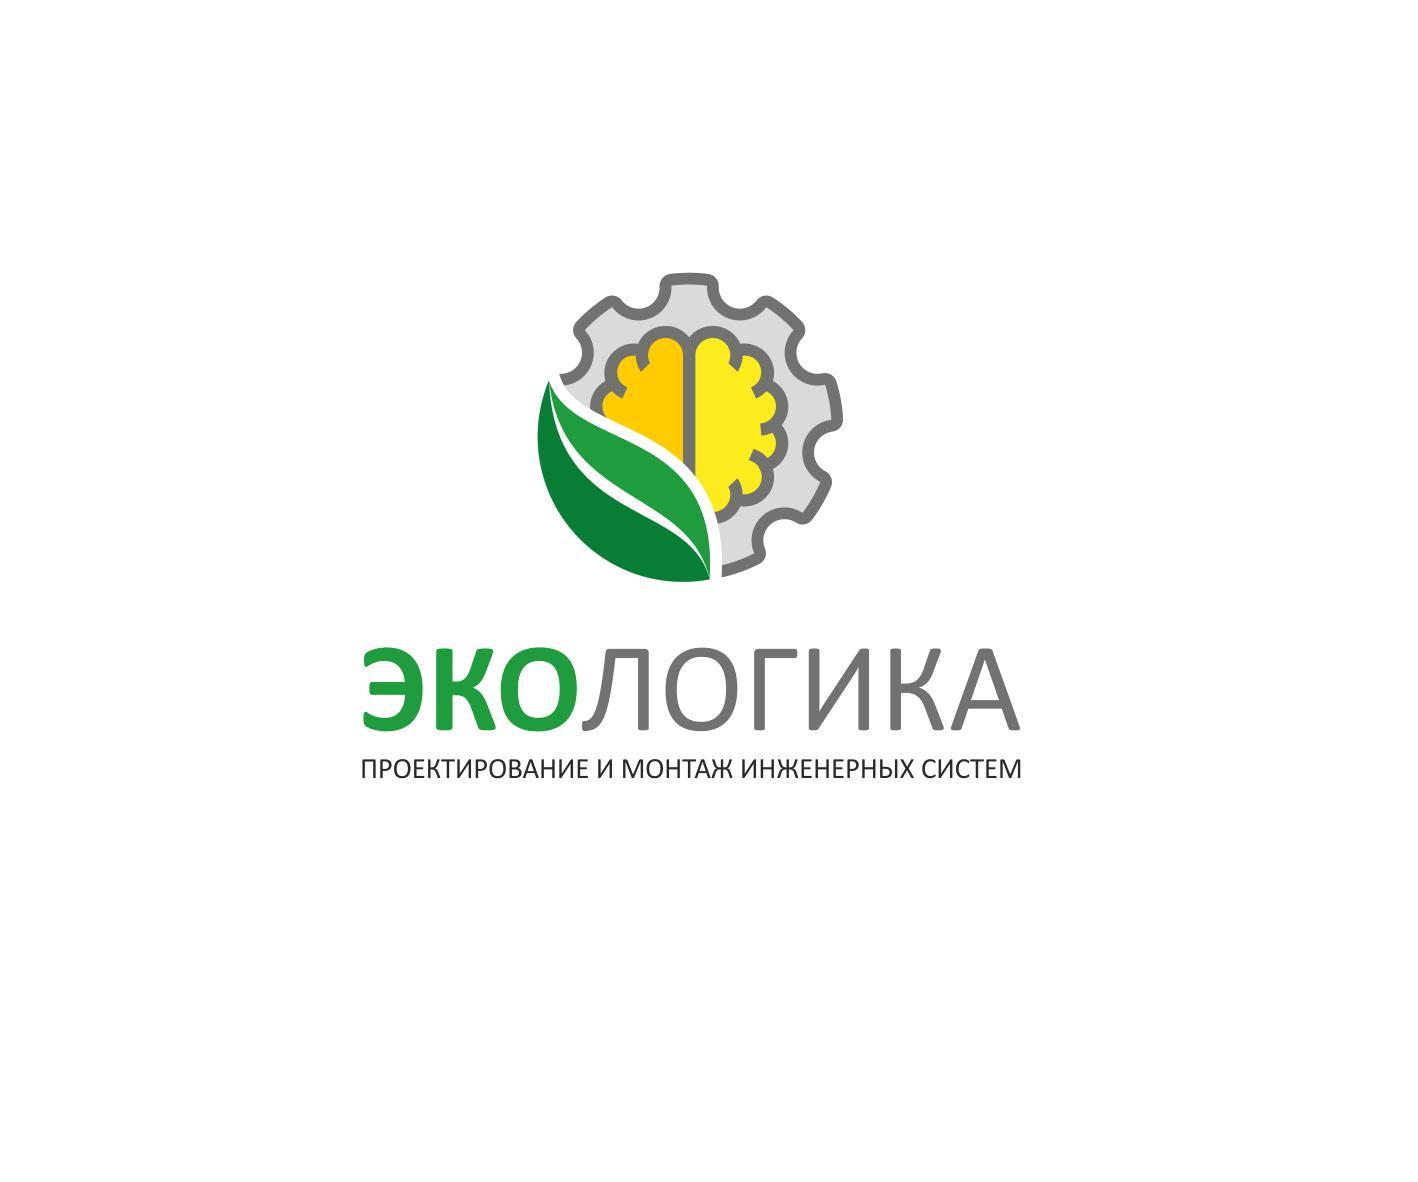 Логотип ЭКОЛОГИКА фото f_1805937e3f2e4384.jpg